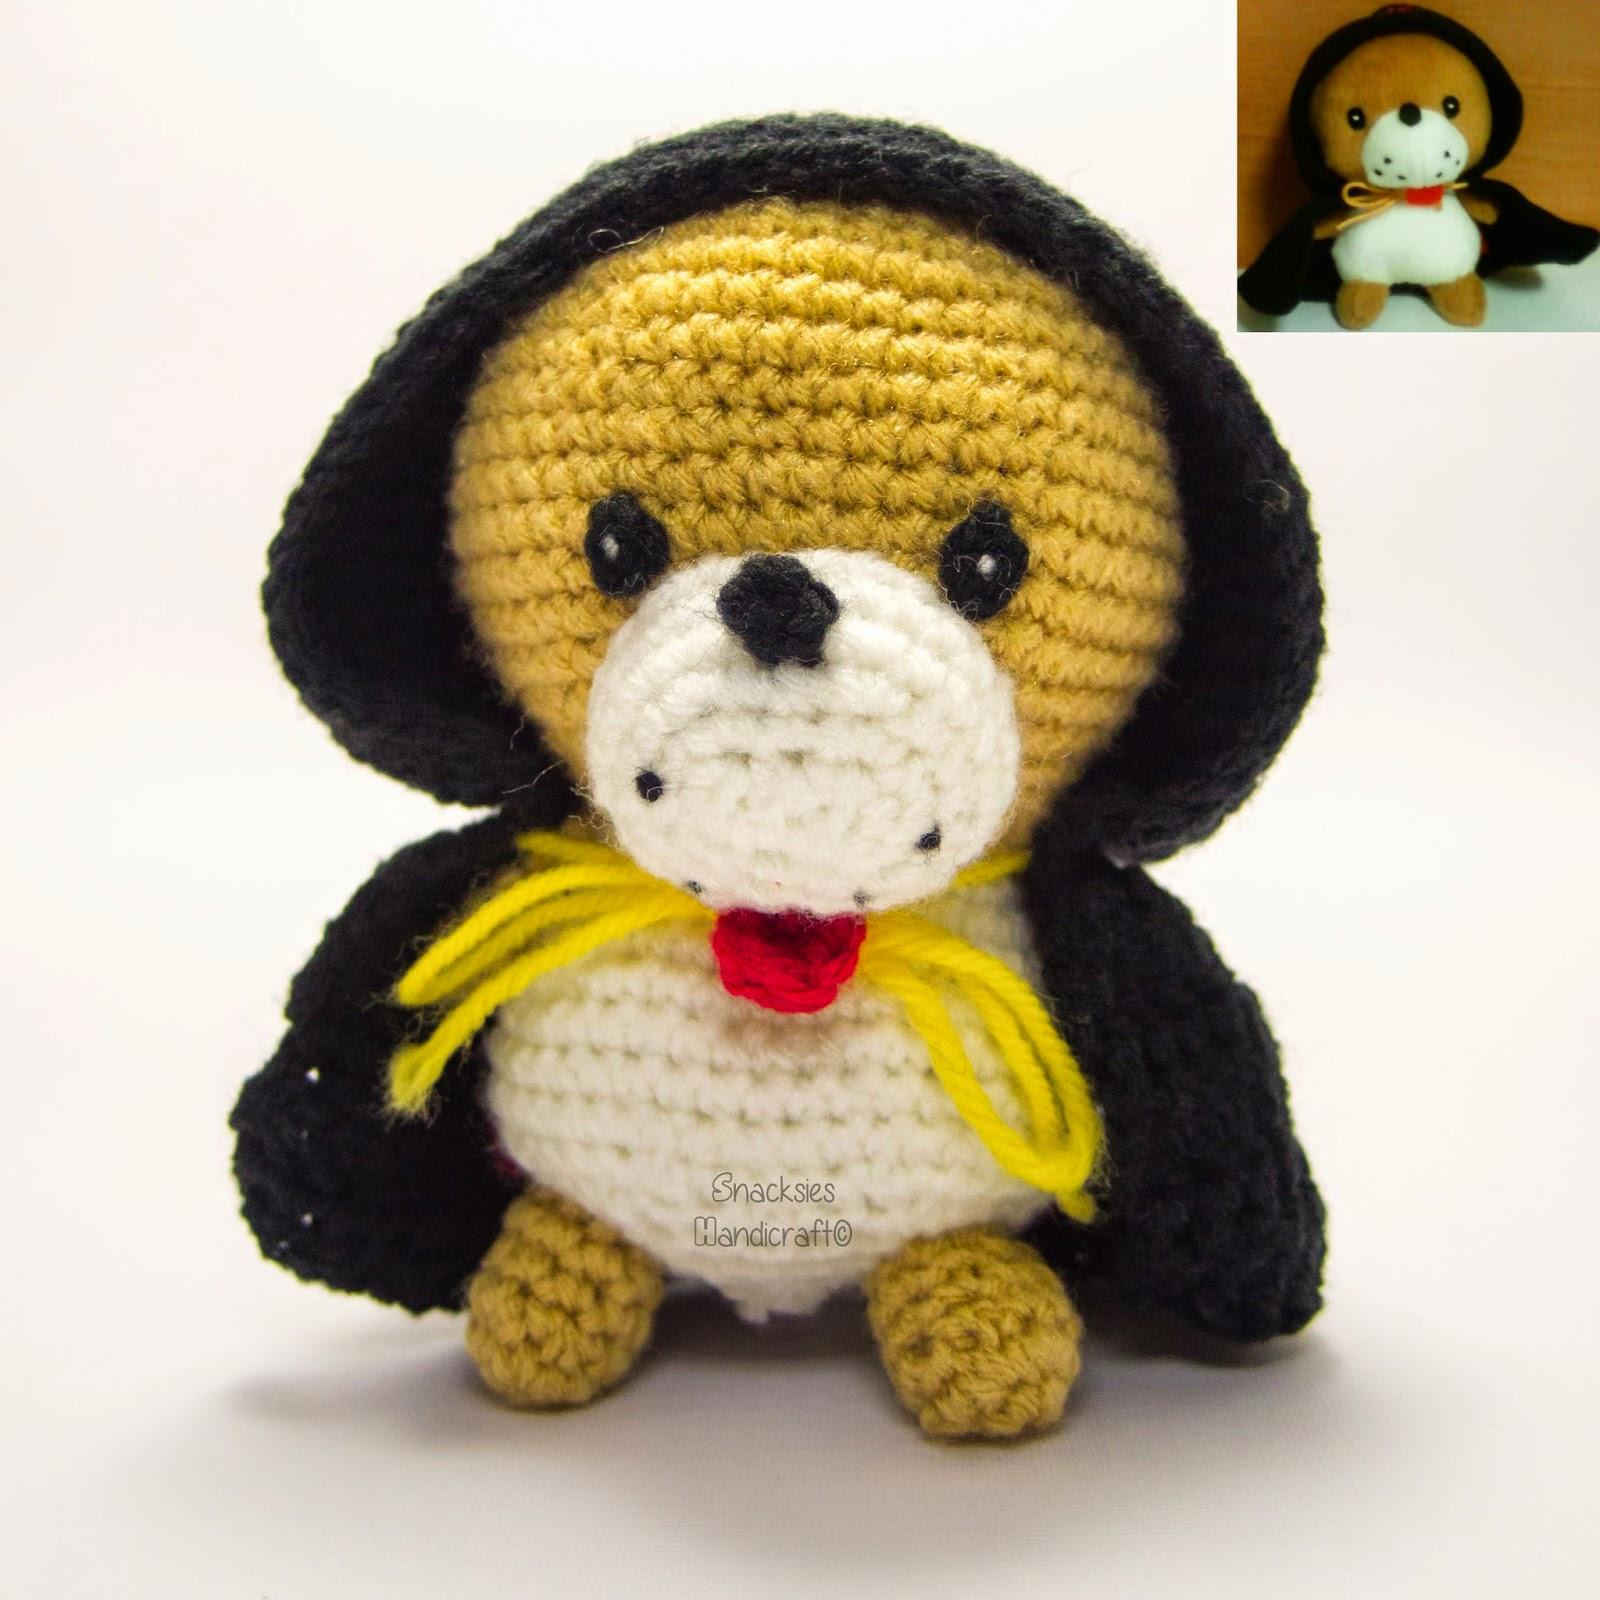 Amigurumi Crochet Toys : Crocheted Replica of Toy - Kiwatarou (???) Amigurumi ...